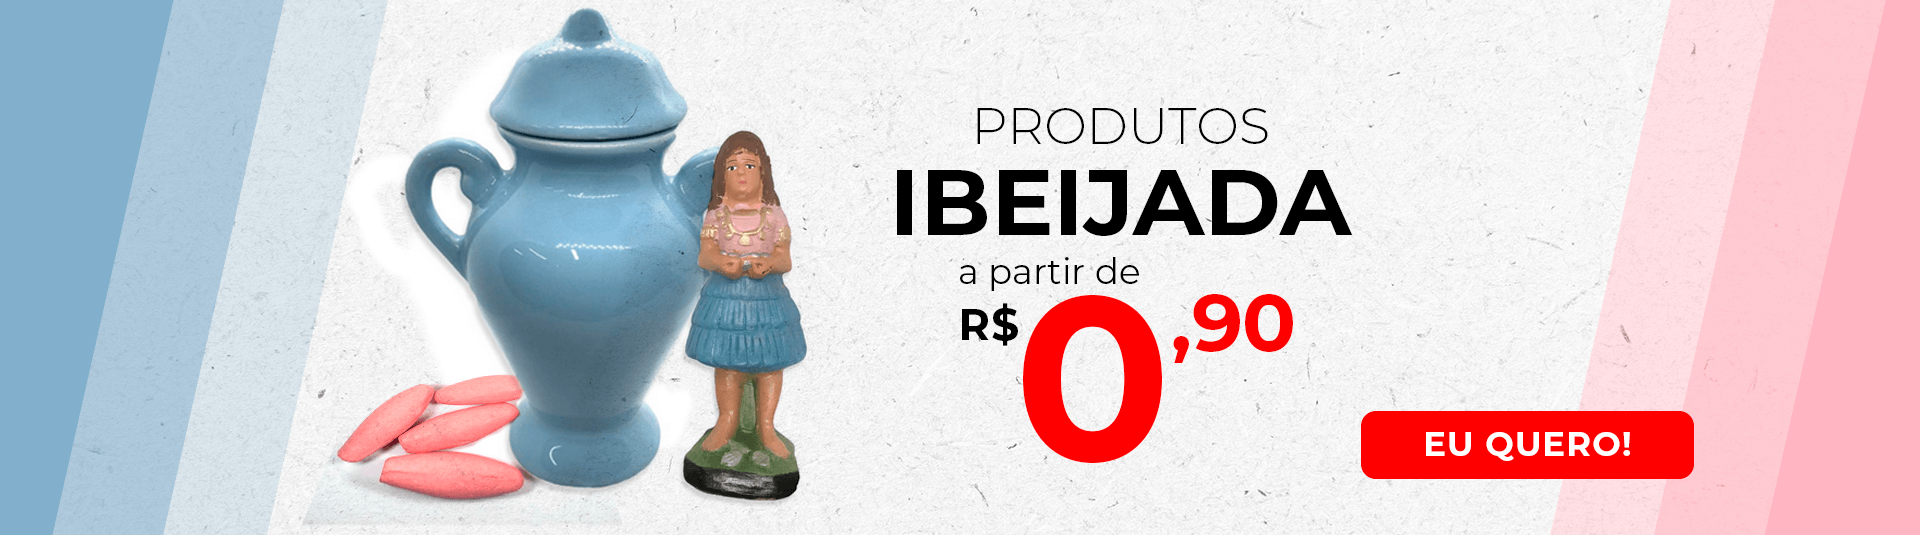 Full Banner Dia de Ibeijada